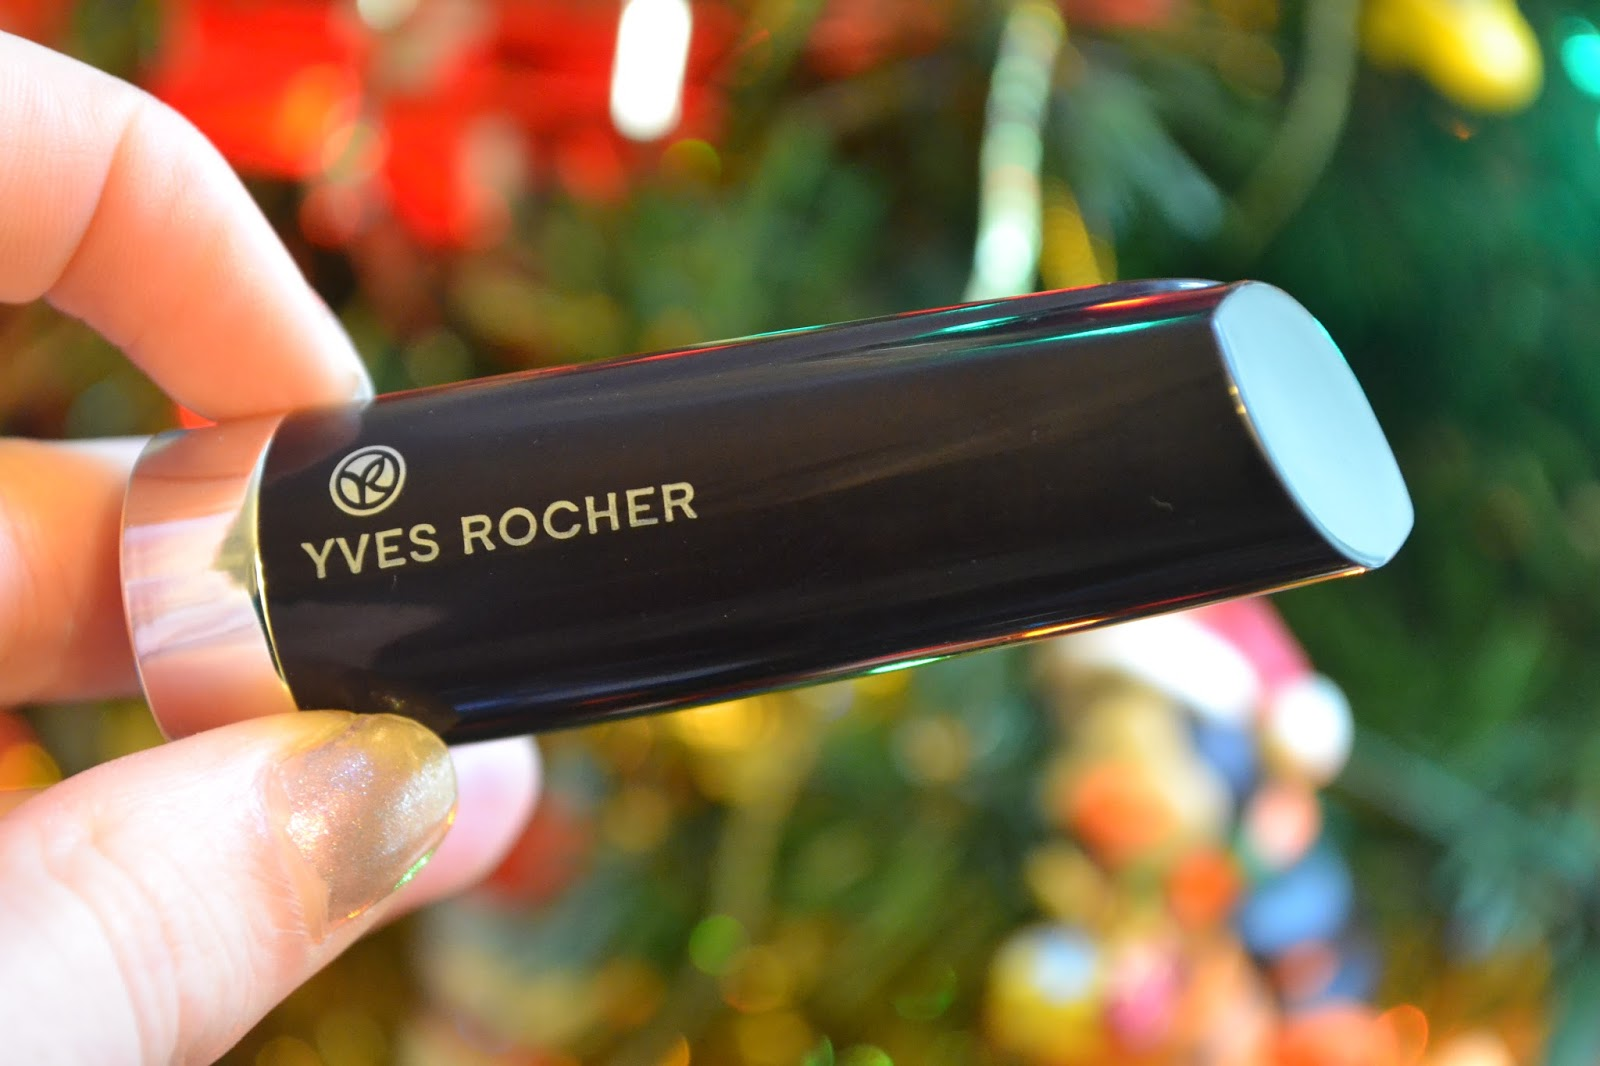 First Look at Yves Rocher Cosmetics - Rachel Nicole UK Blogger